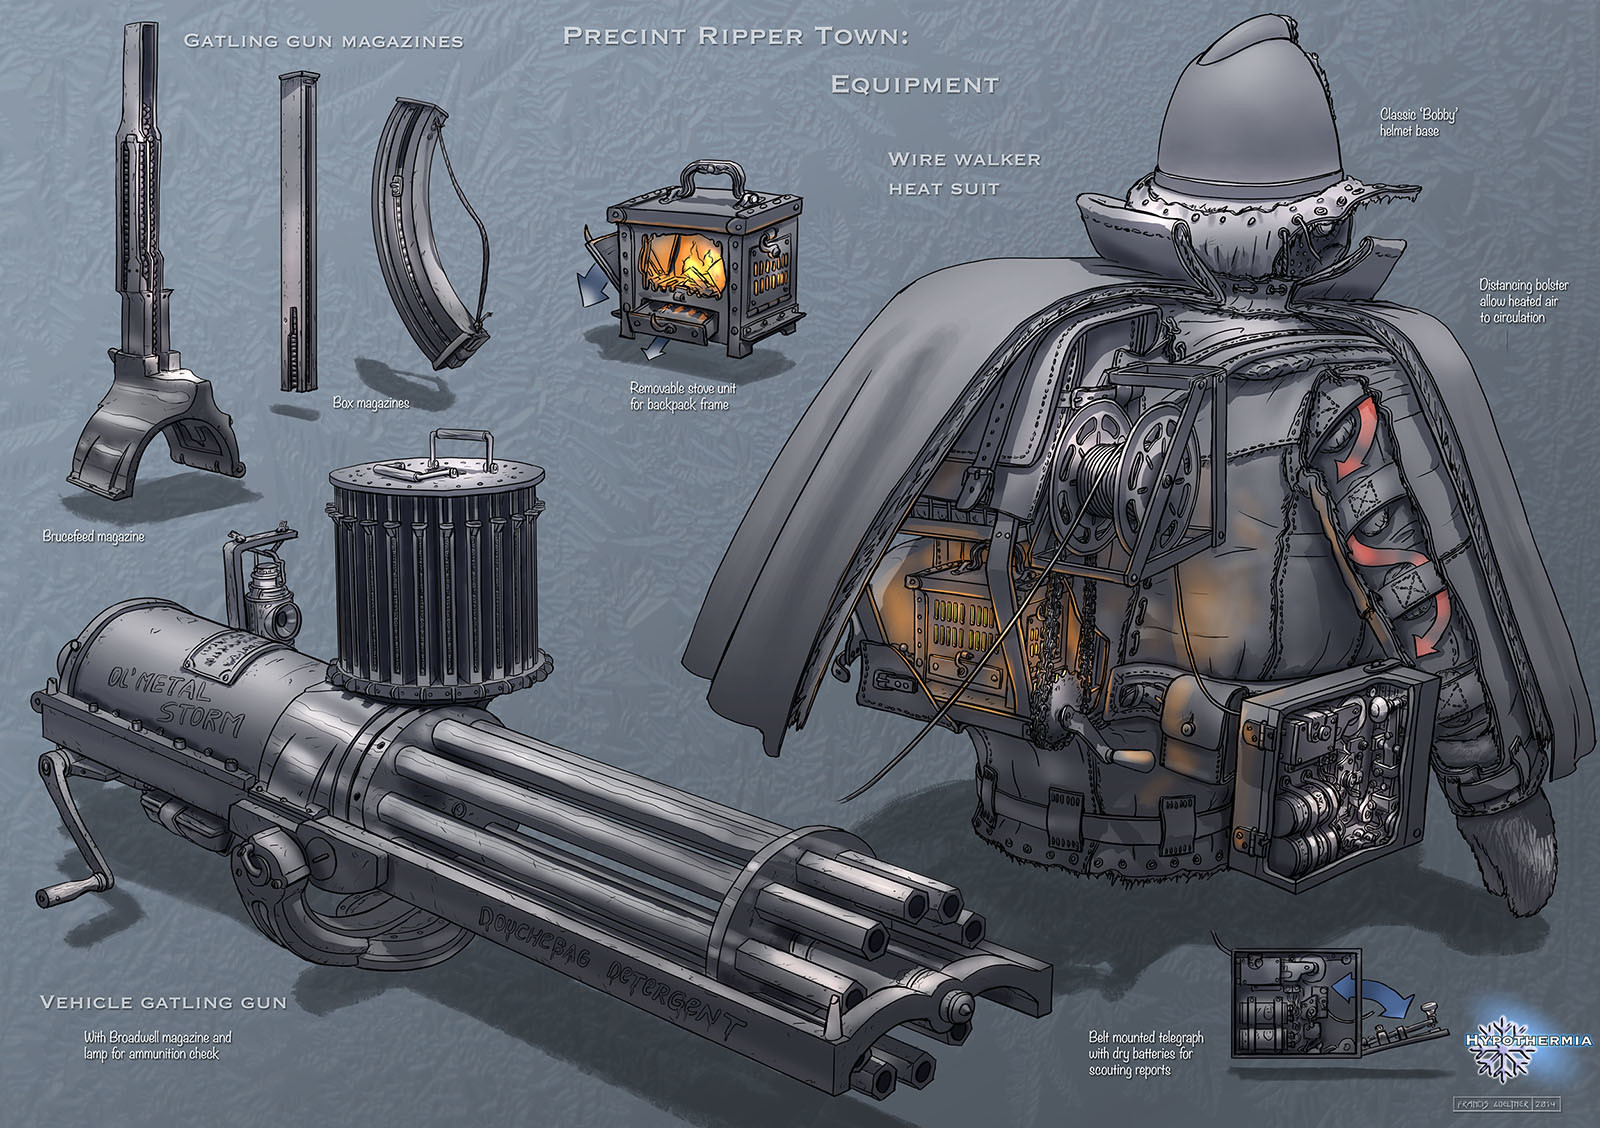 Precinct Ripper Town – Equipment